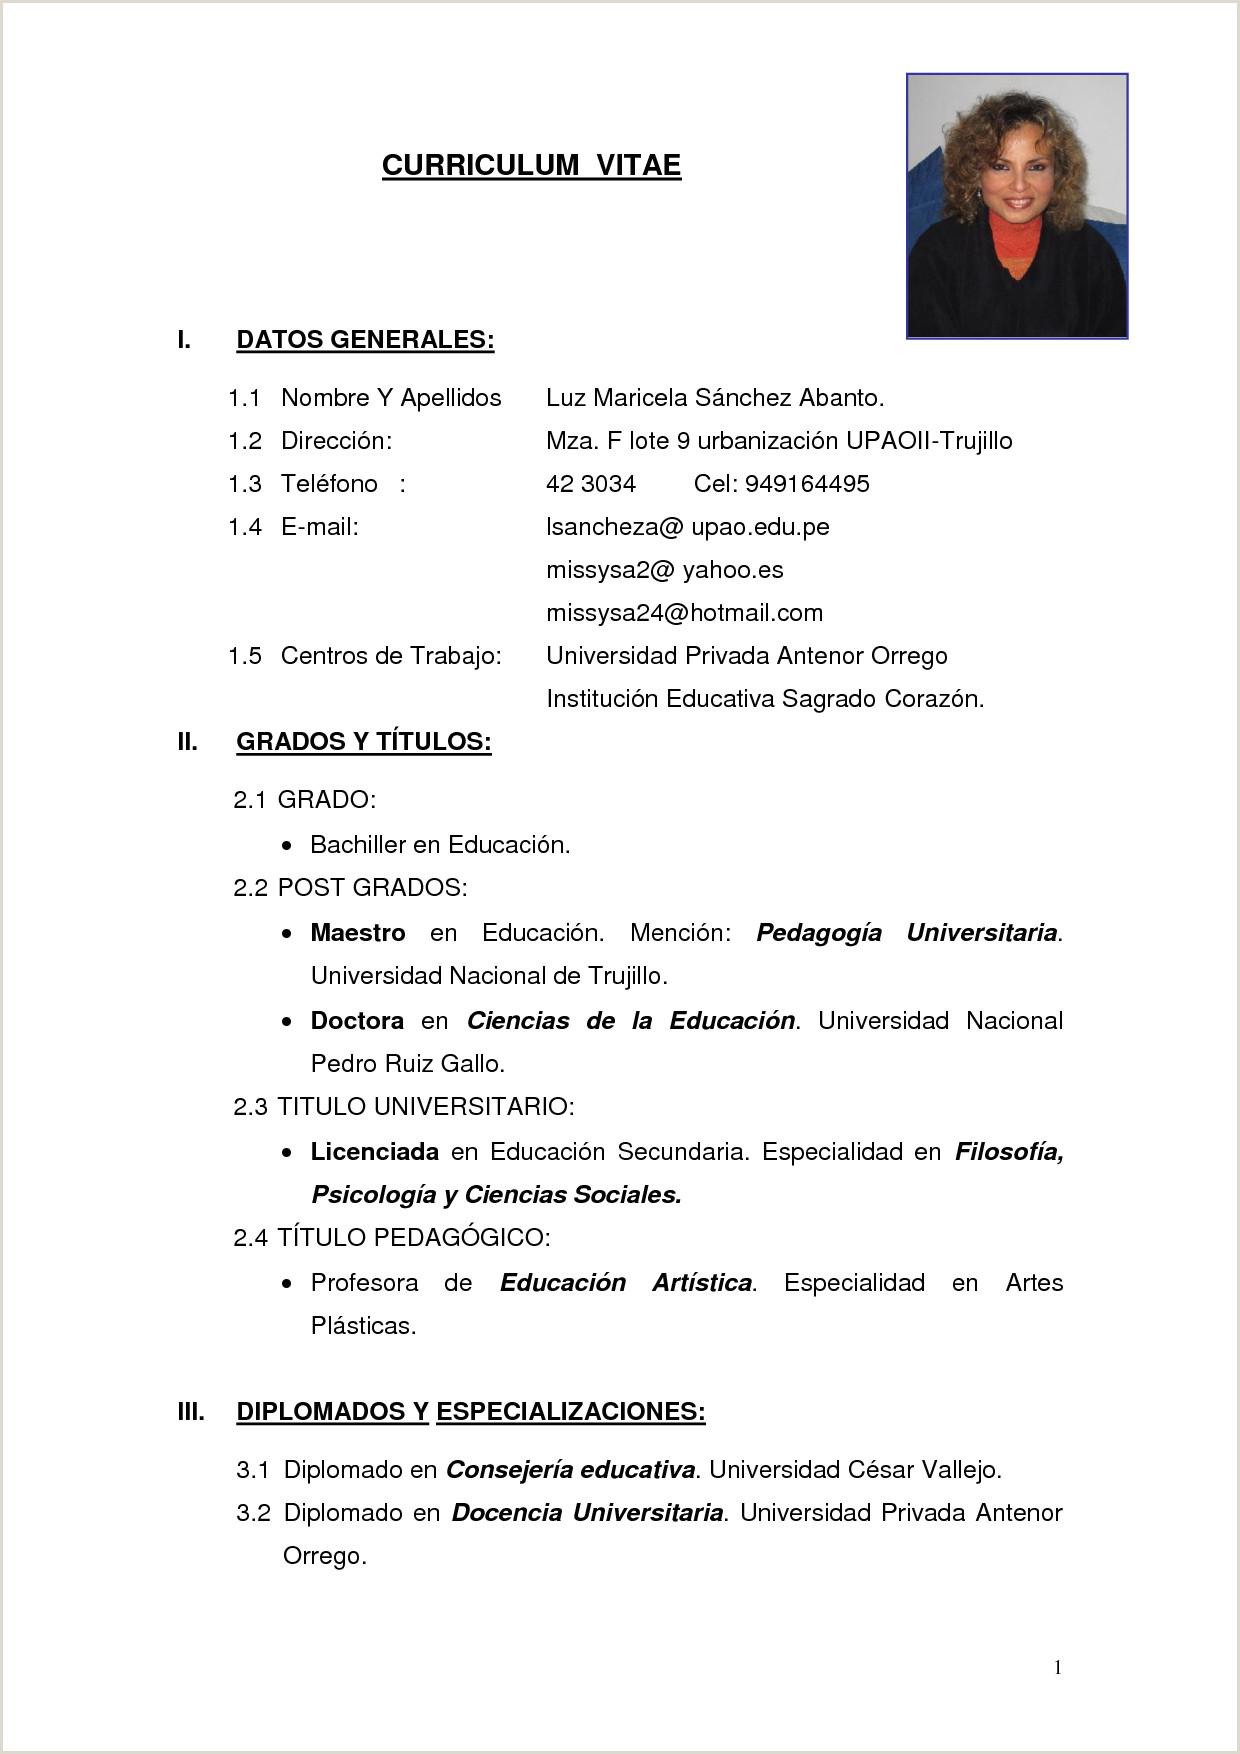 Curriculum Vitae Para Rellenar Facil Resultado De Imagen Para Curriculum Simple Fg